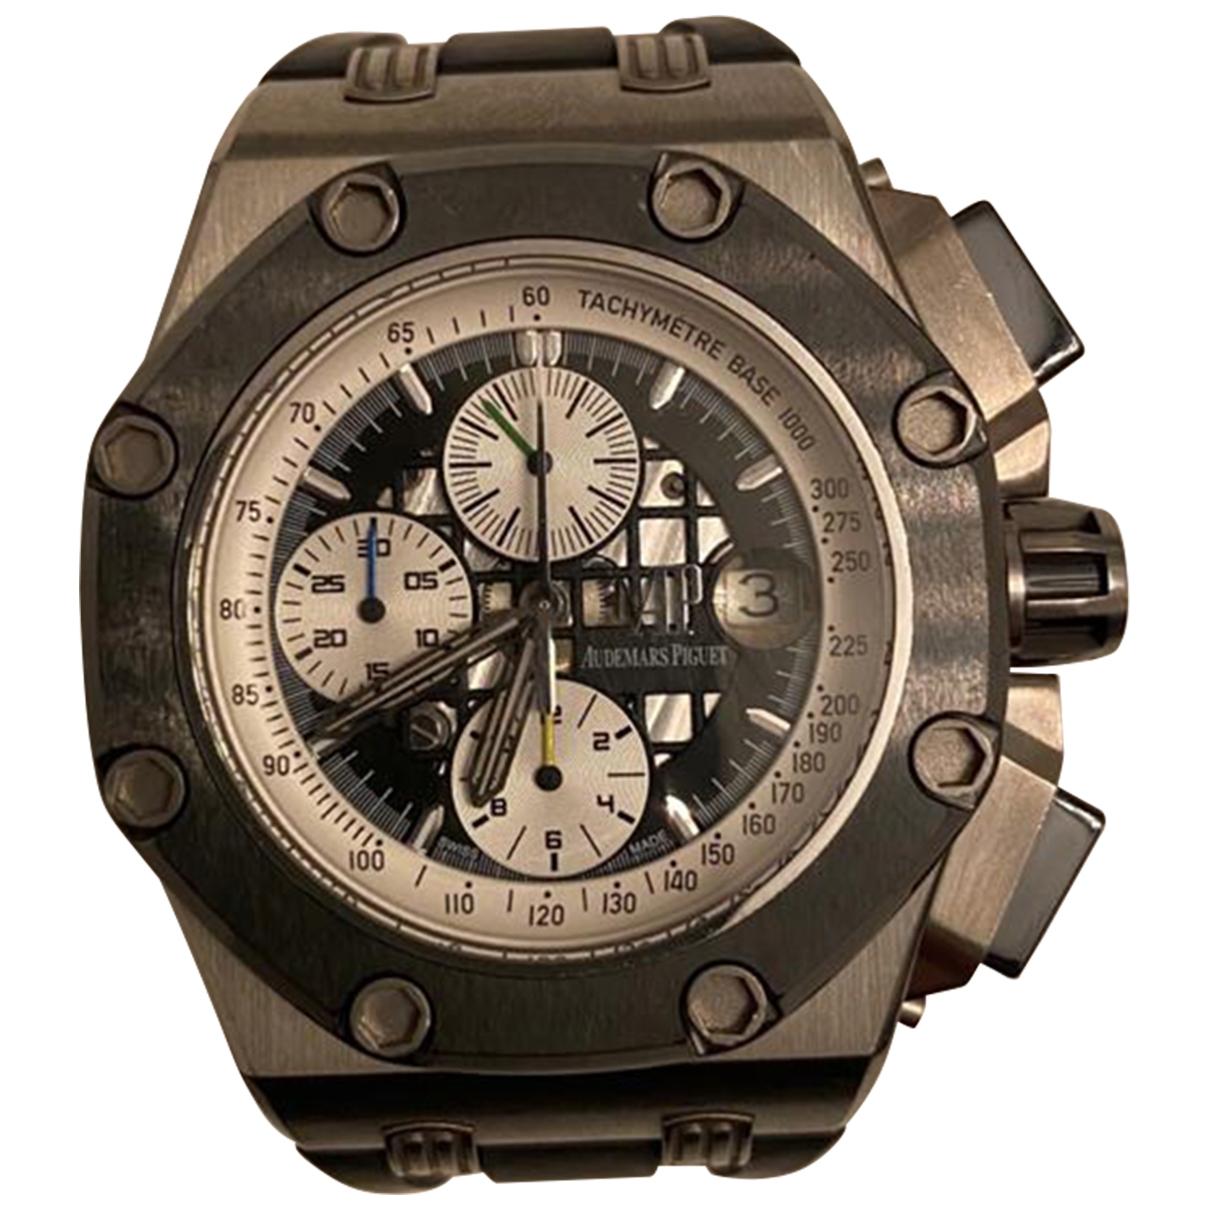 Audemars Piguet Royal Oak Offshore Uhr in  Metallic Titan